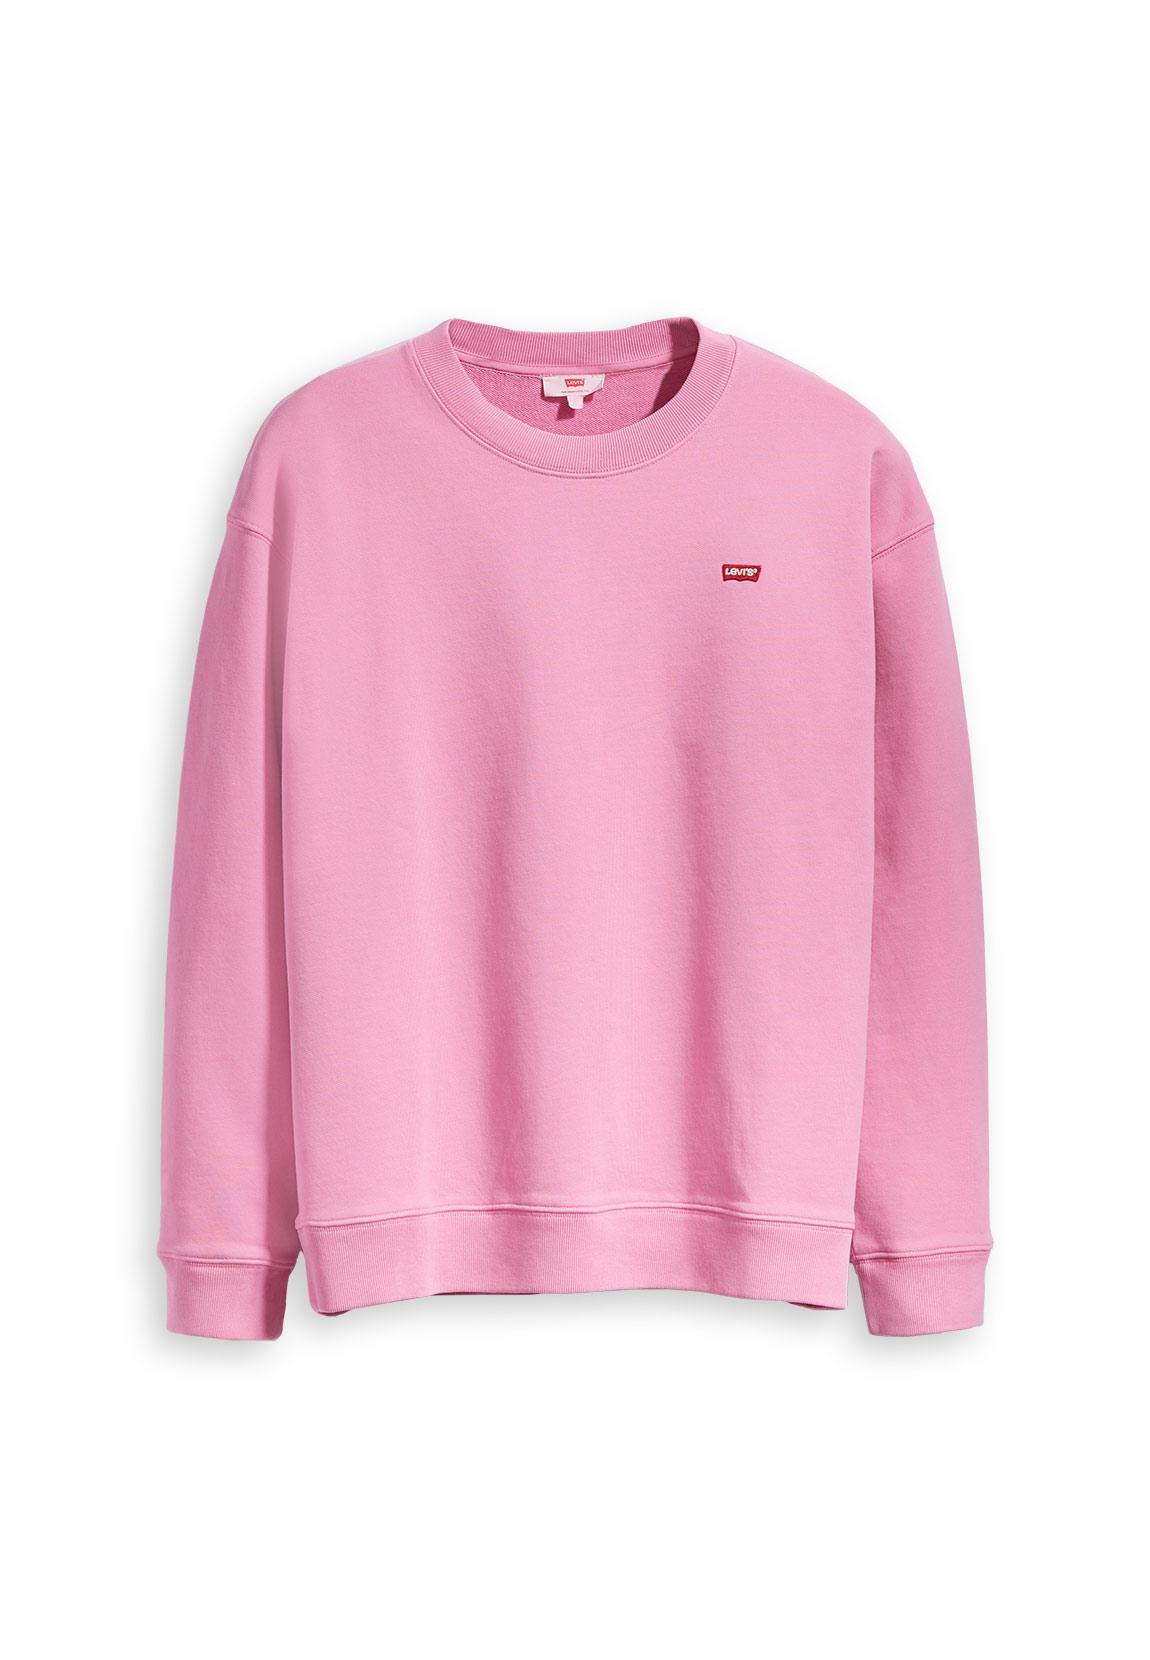 newest collection 748d9 d97cd Levi´s Sweater Damen OVERSIZED CREWNECK 56333-0001 Pink